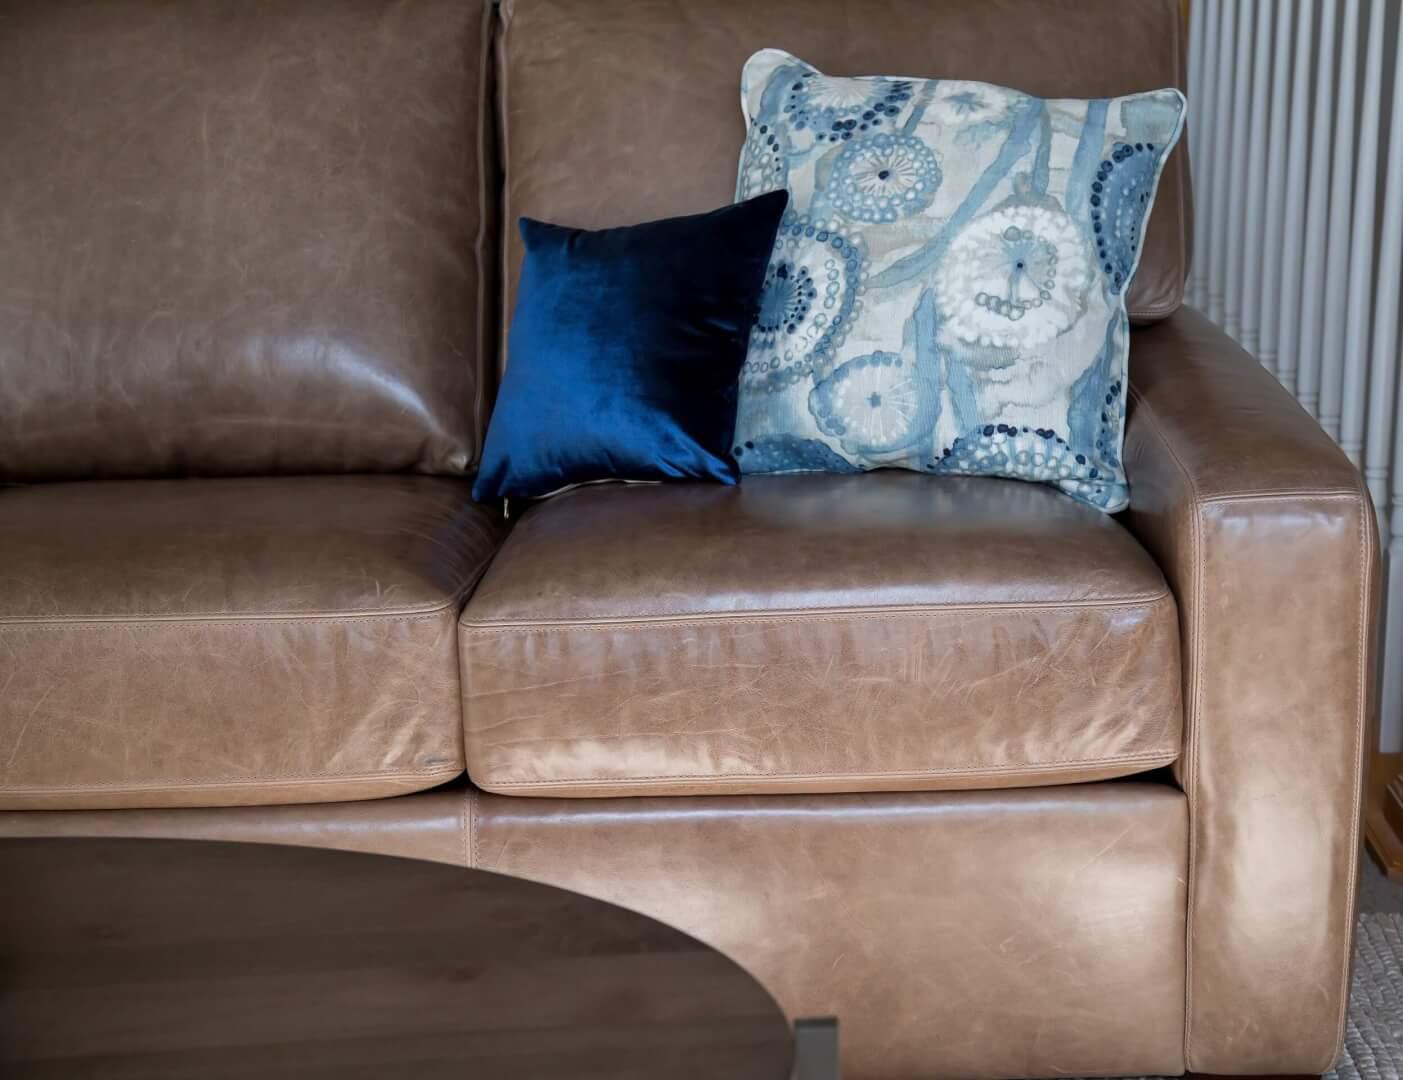 Carson-sofa-Angela-lahr-Pappenheimers-project